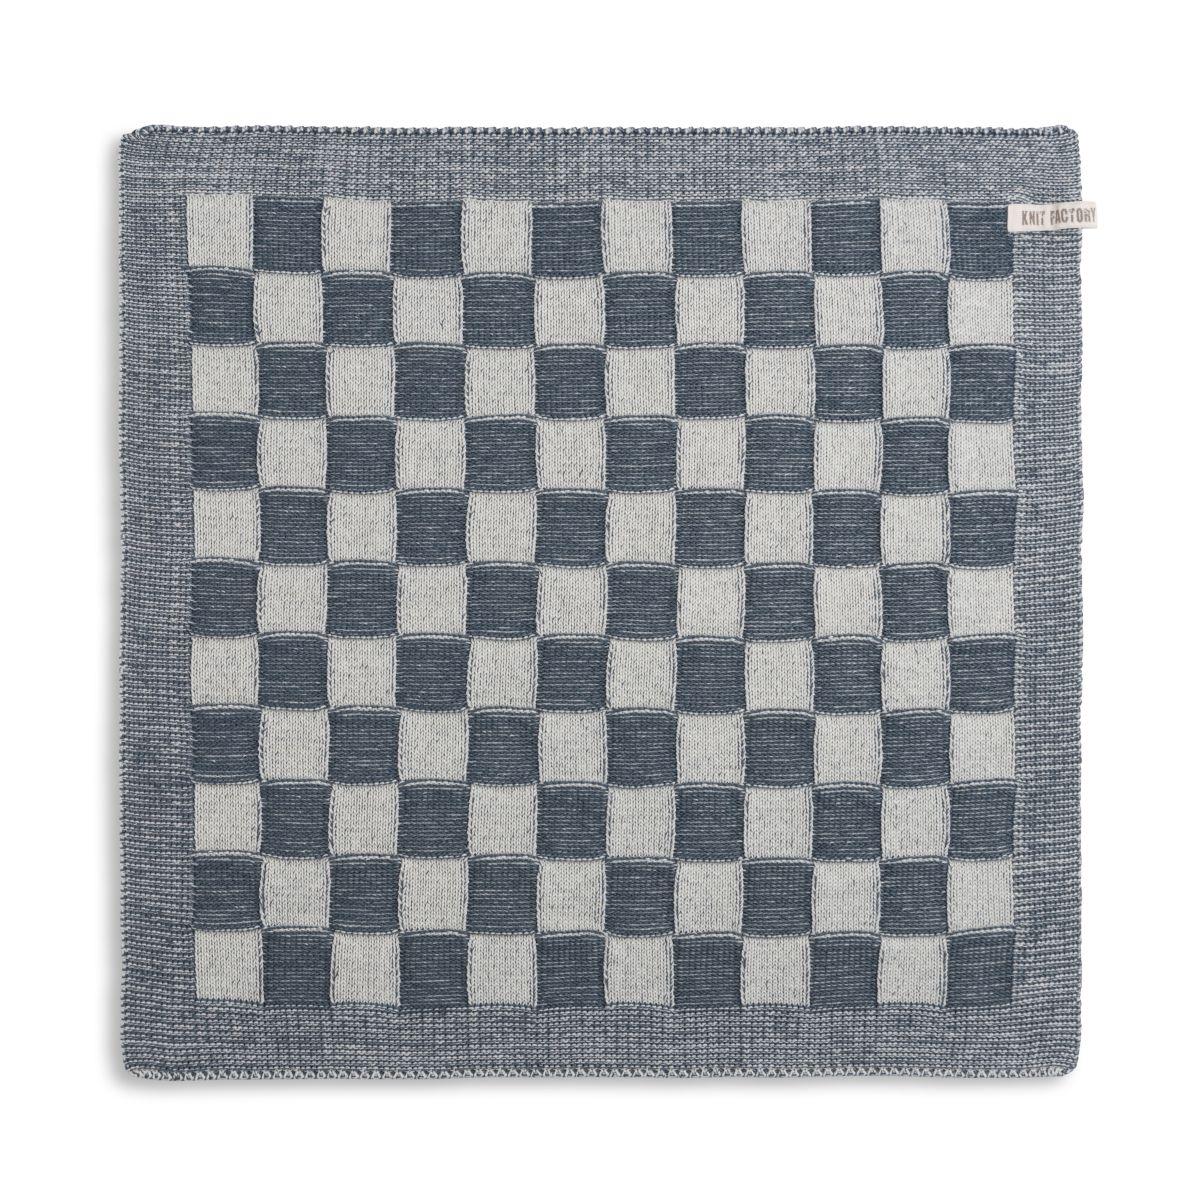 knit factory 2010082 keukendoek grote blok 2 kleuren ecru granit